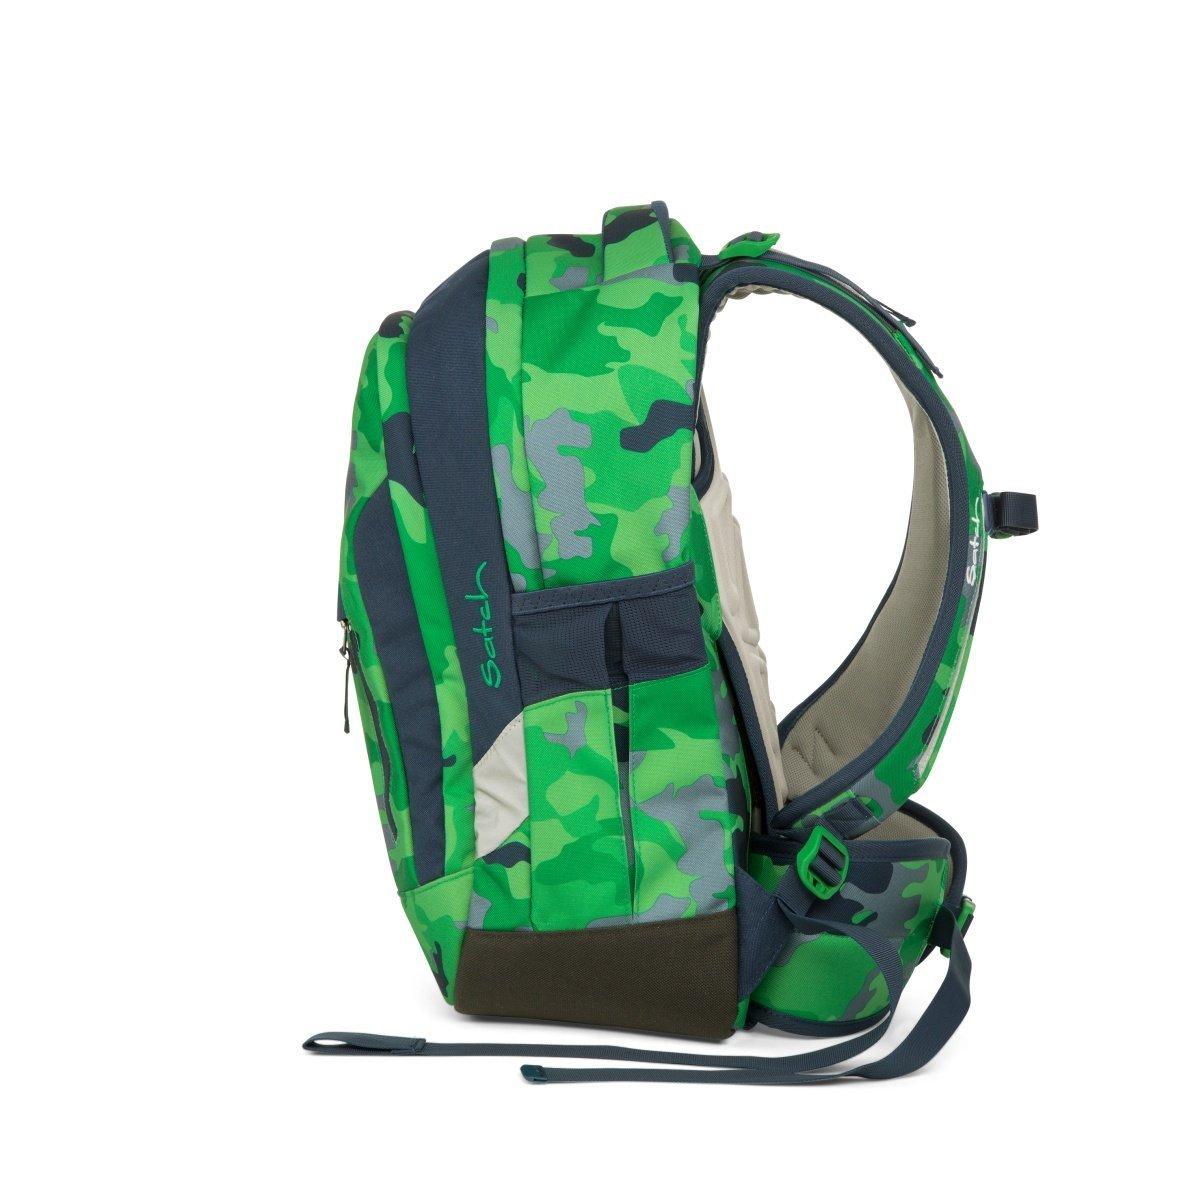 Рюкзак Ergobag Satch Sleek цвет Green Camou, - фото 3